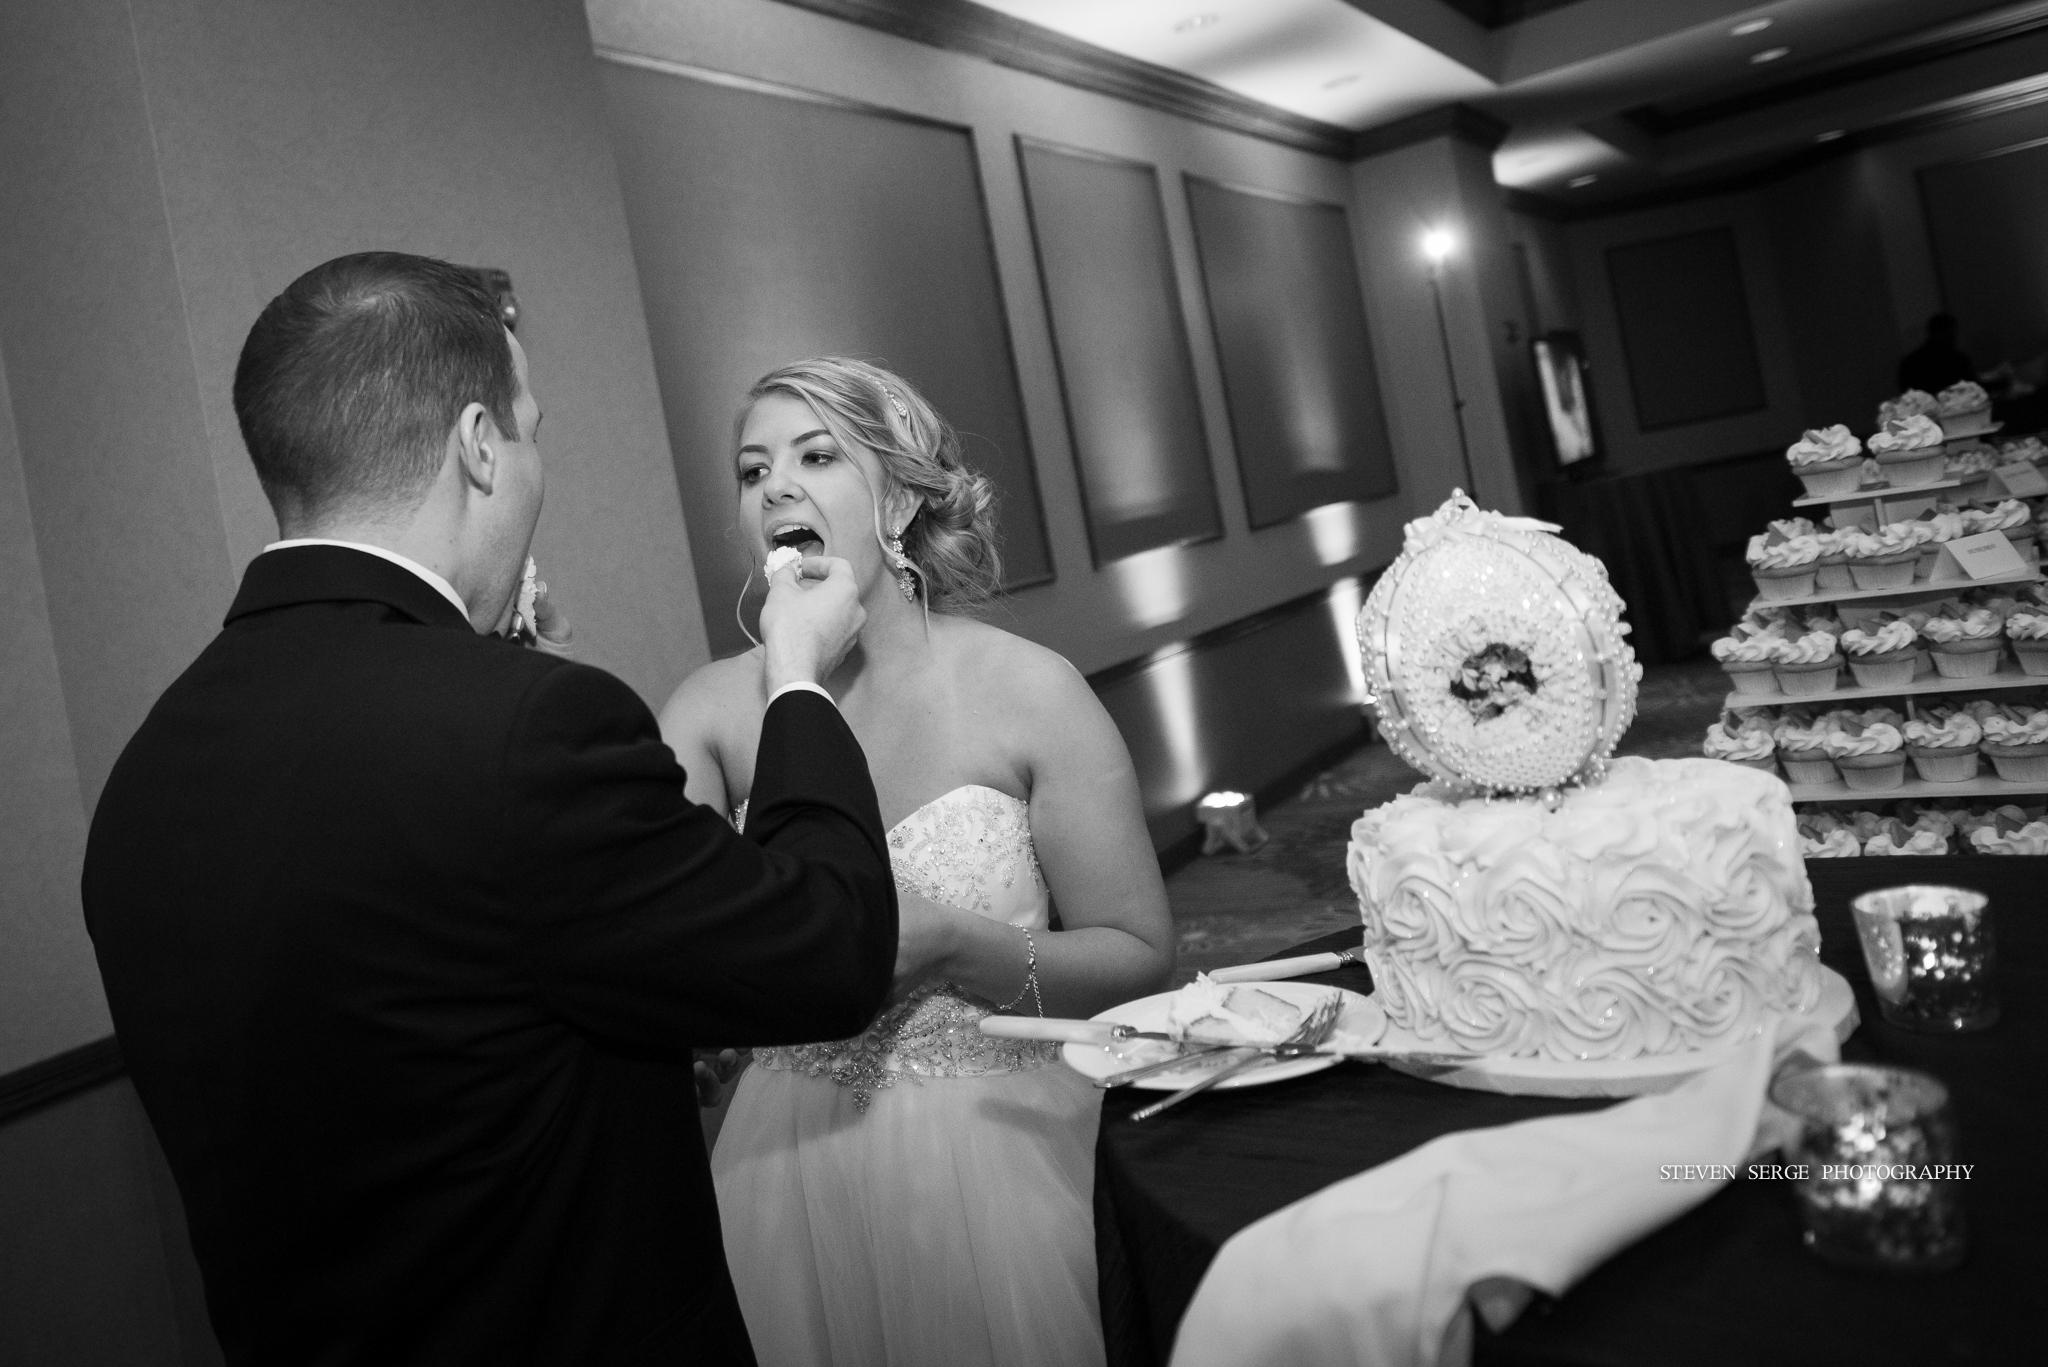 scranton-wedding-photographers-hilton-steven-serge-photography-24.jpg